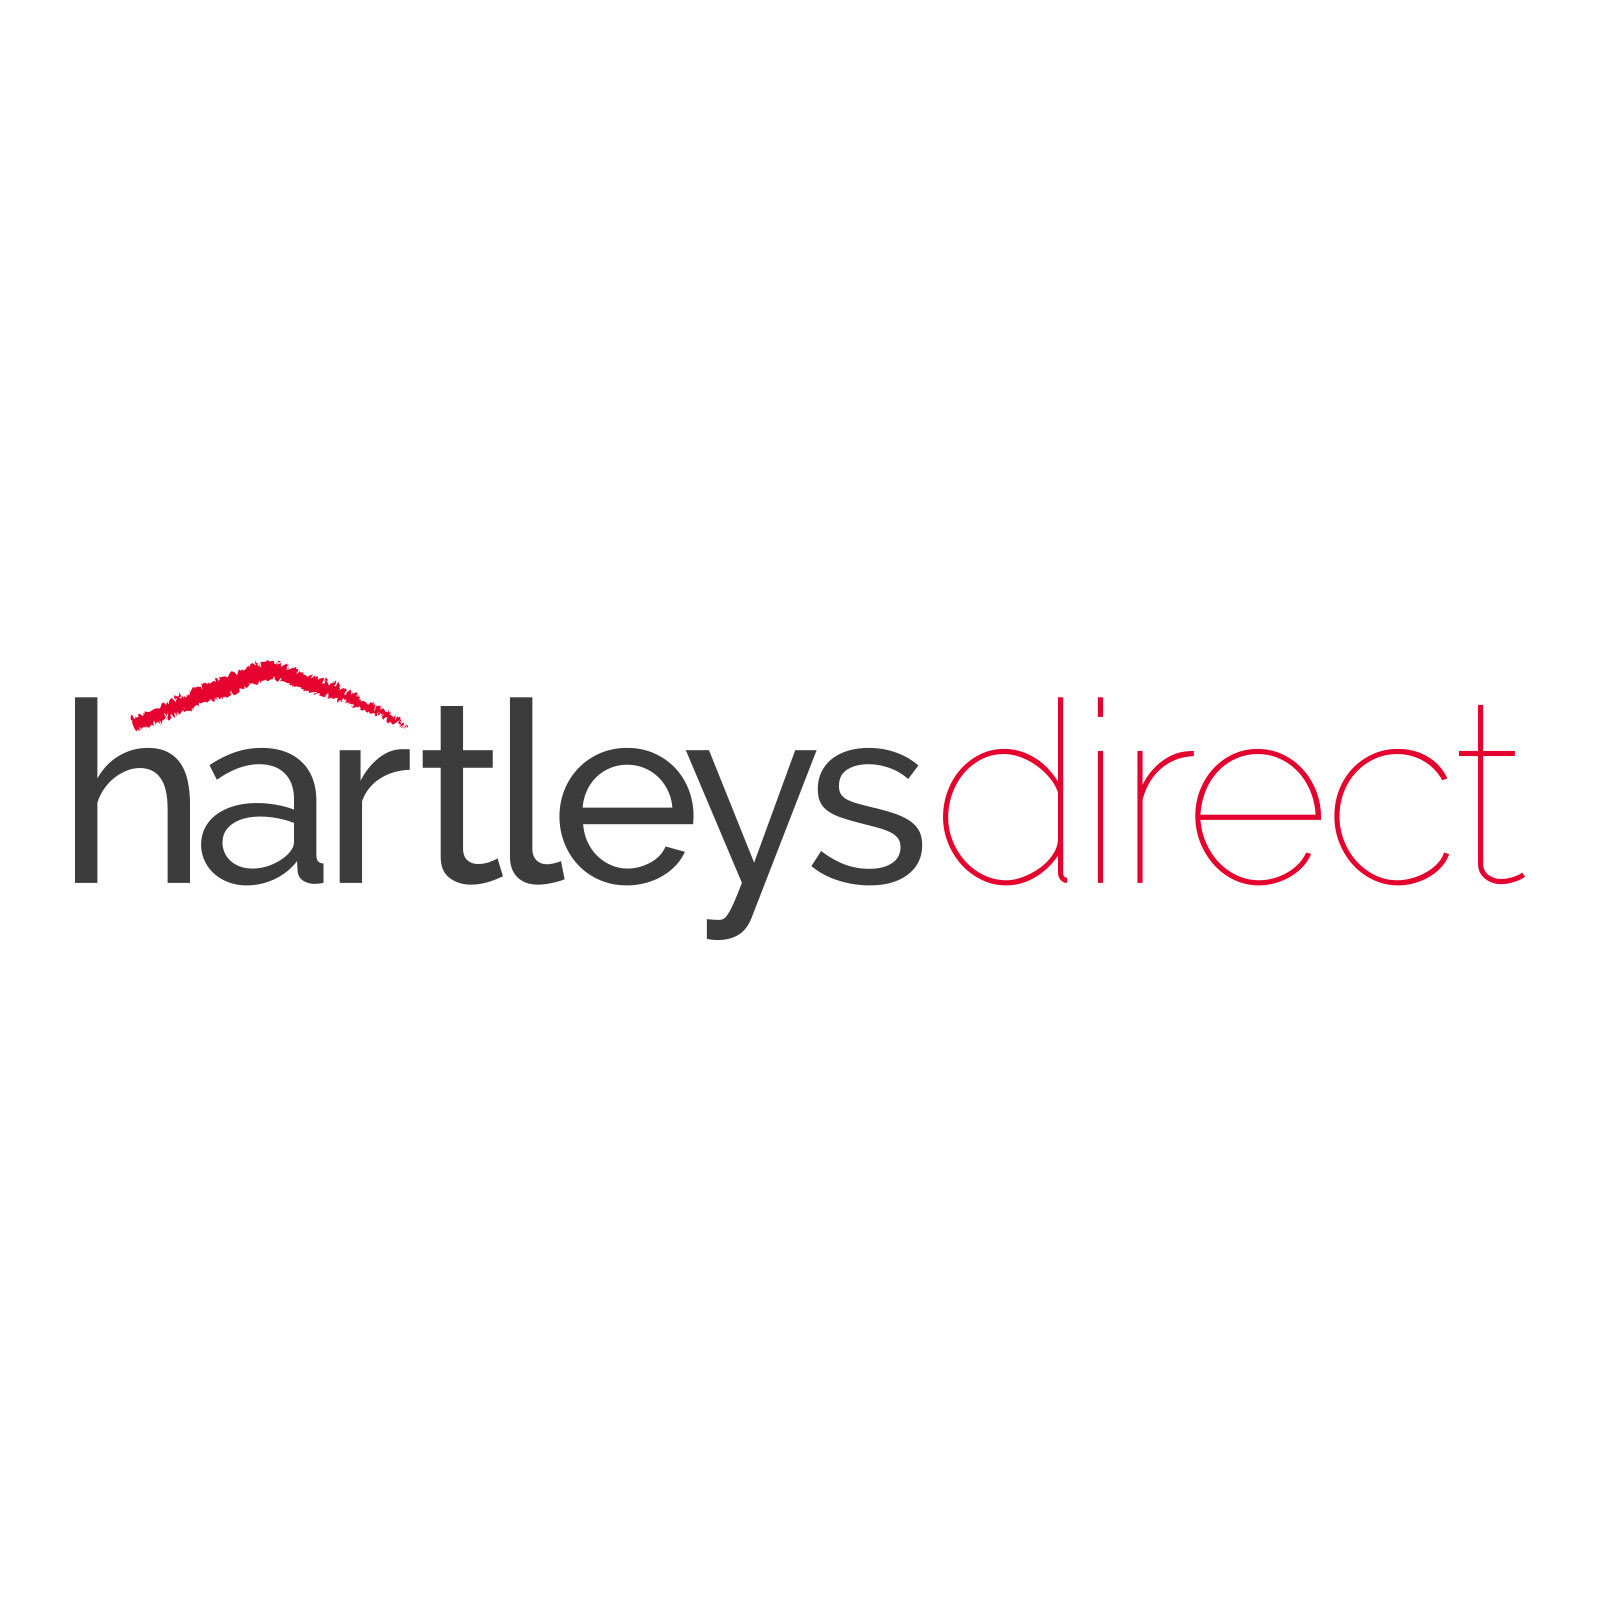 Hartleys-Set-of-3-Backed-House-Shaped-Wall-Shelves-on-White-Background.jpg